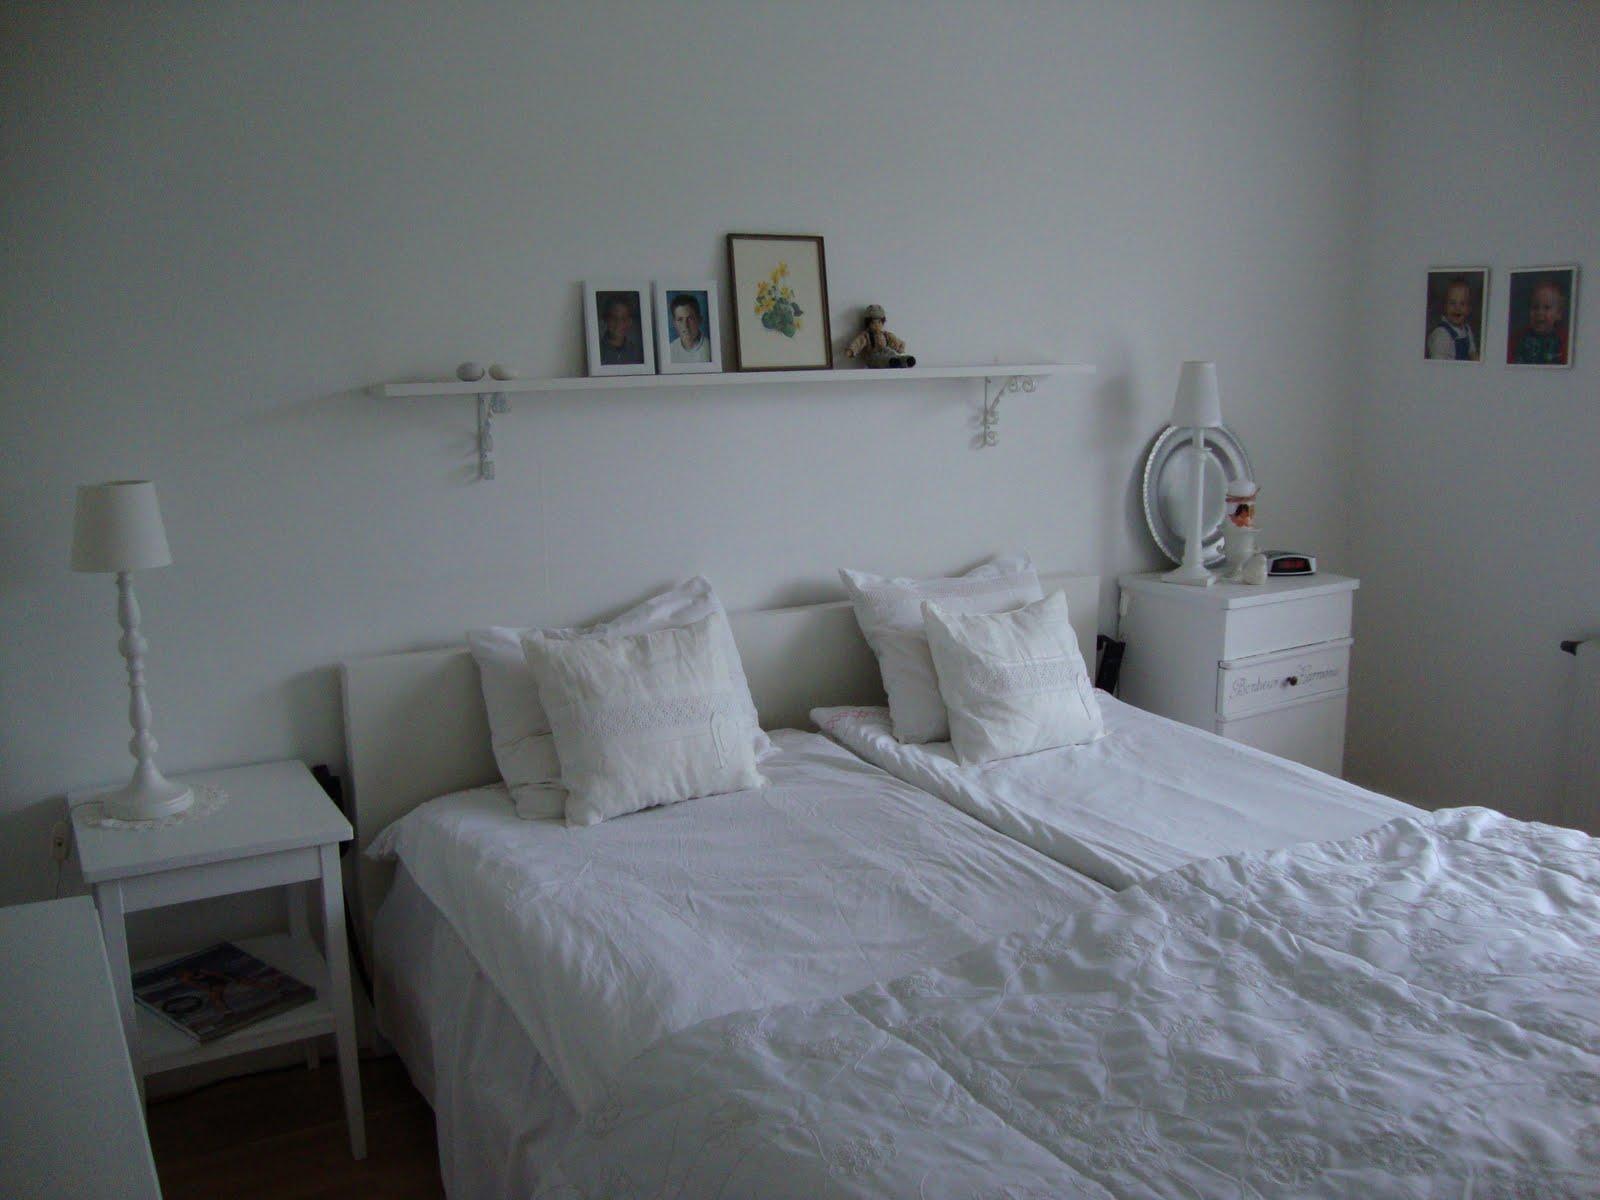 Camillas vita villa: mitt vita sovrum...